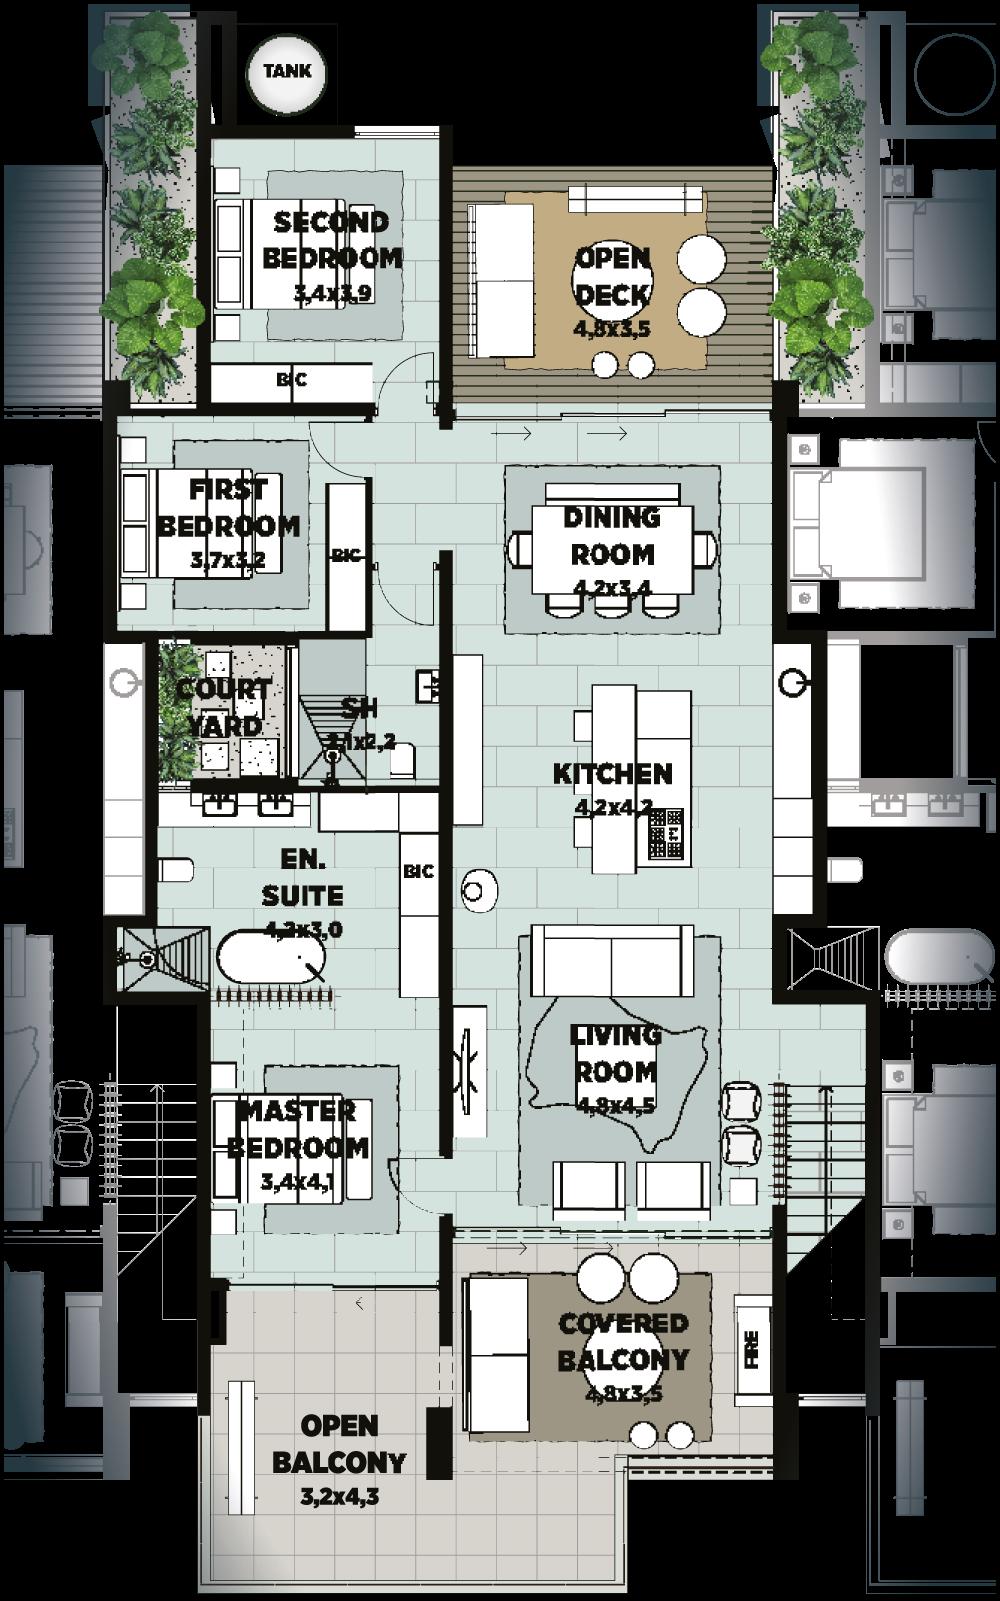 unit d townhouse floorplan